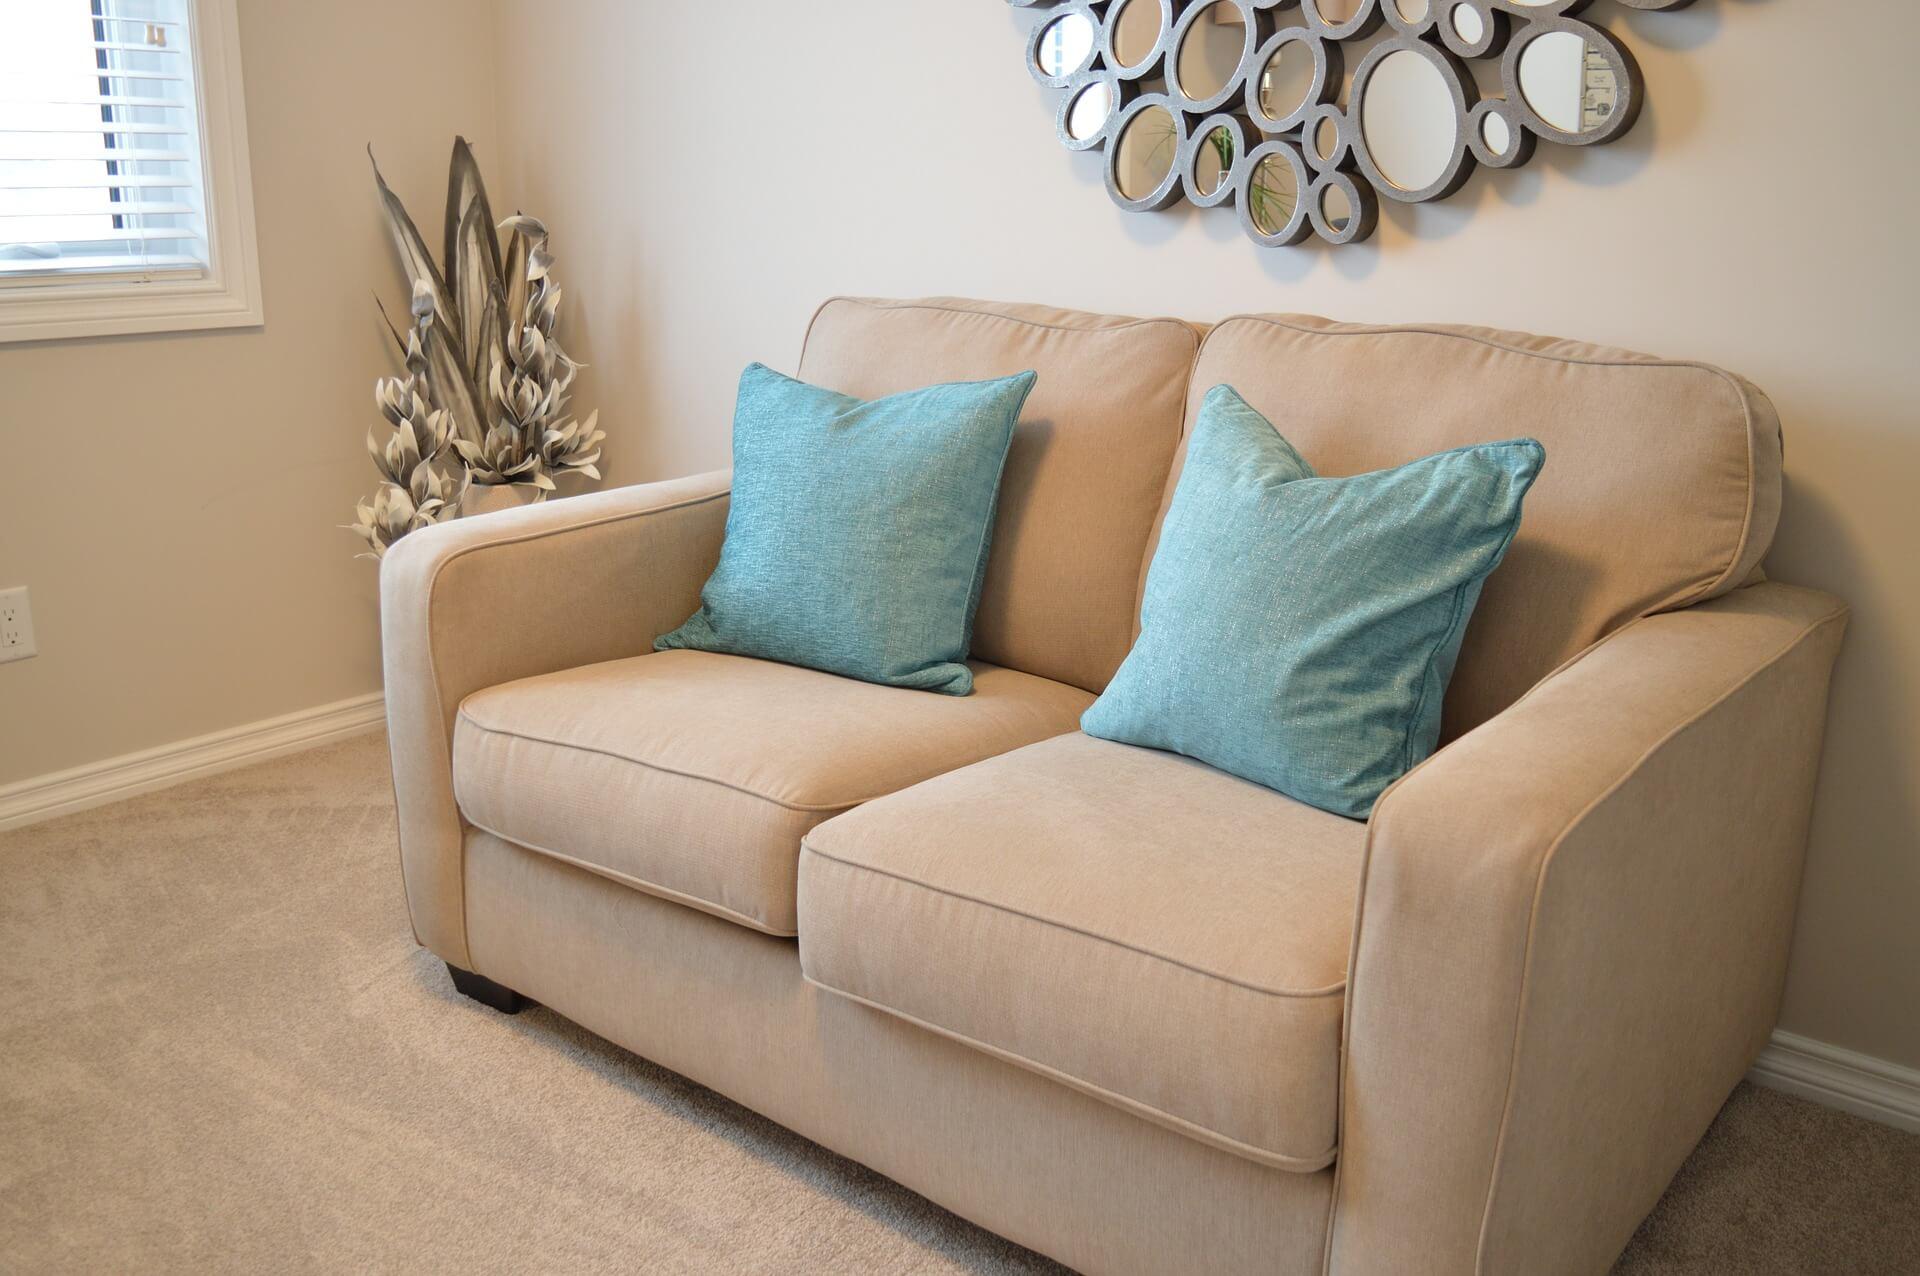 Goedkope meubelen kopen